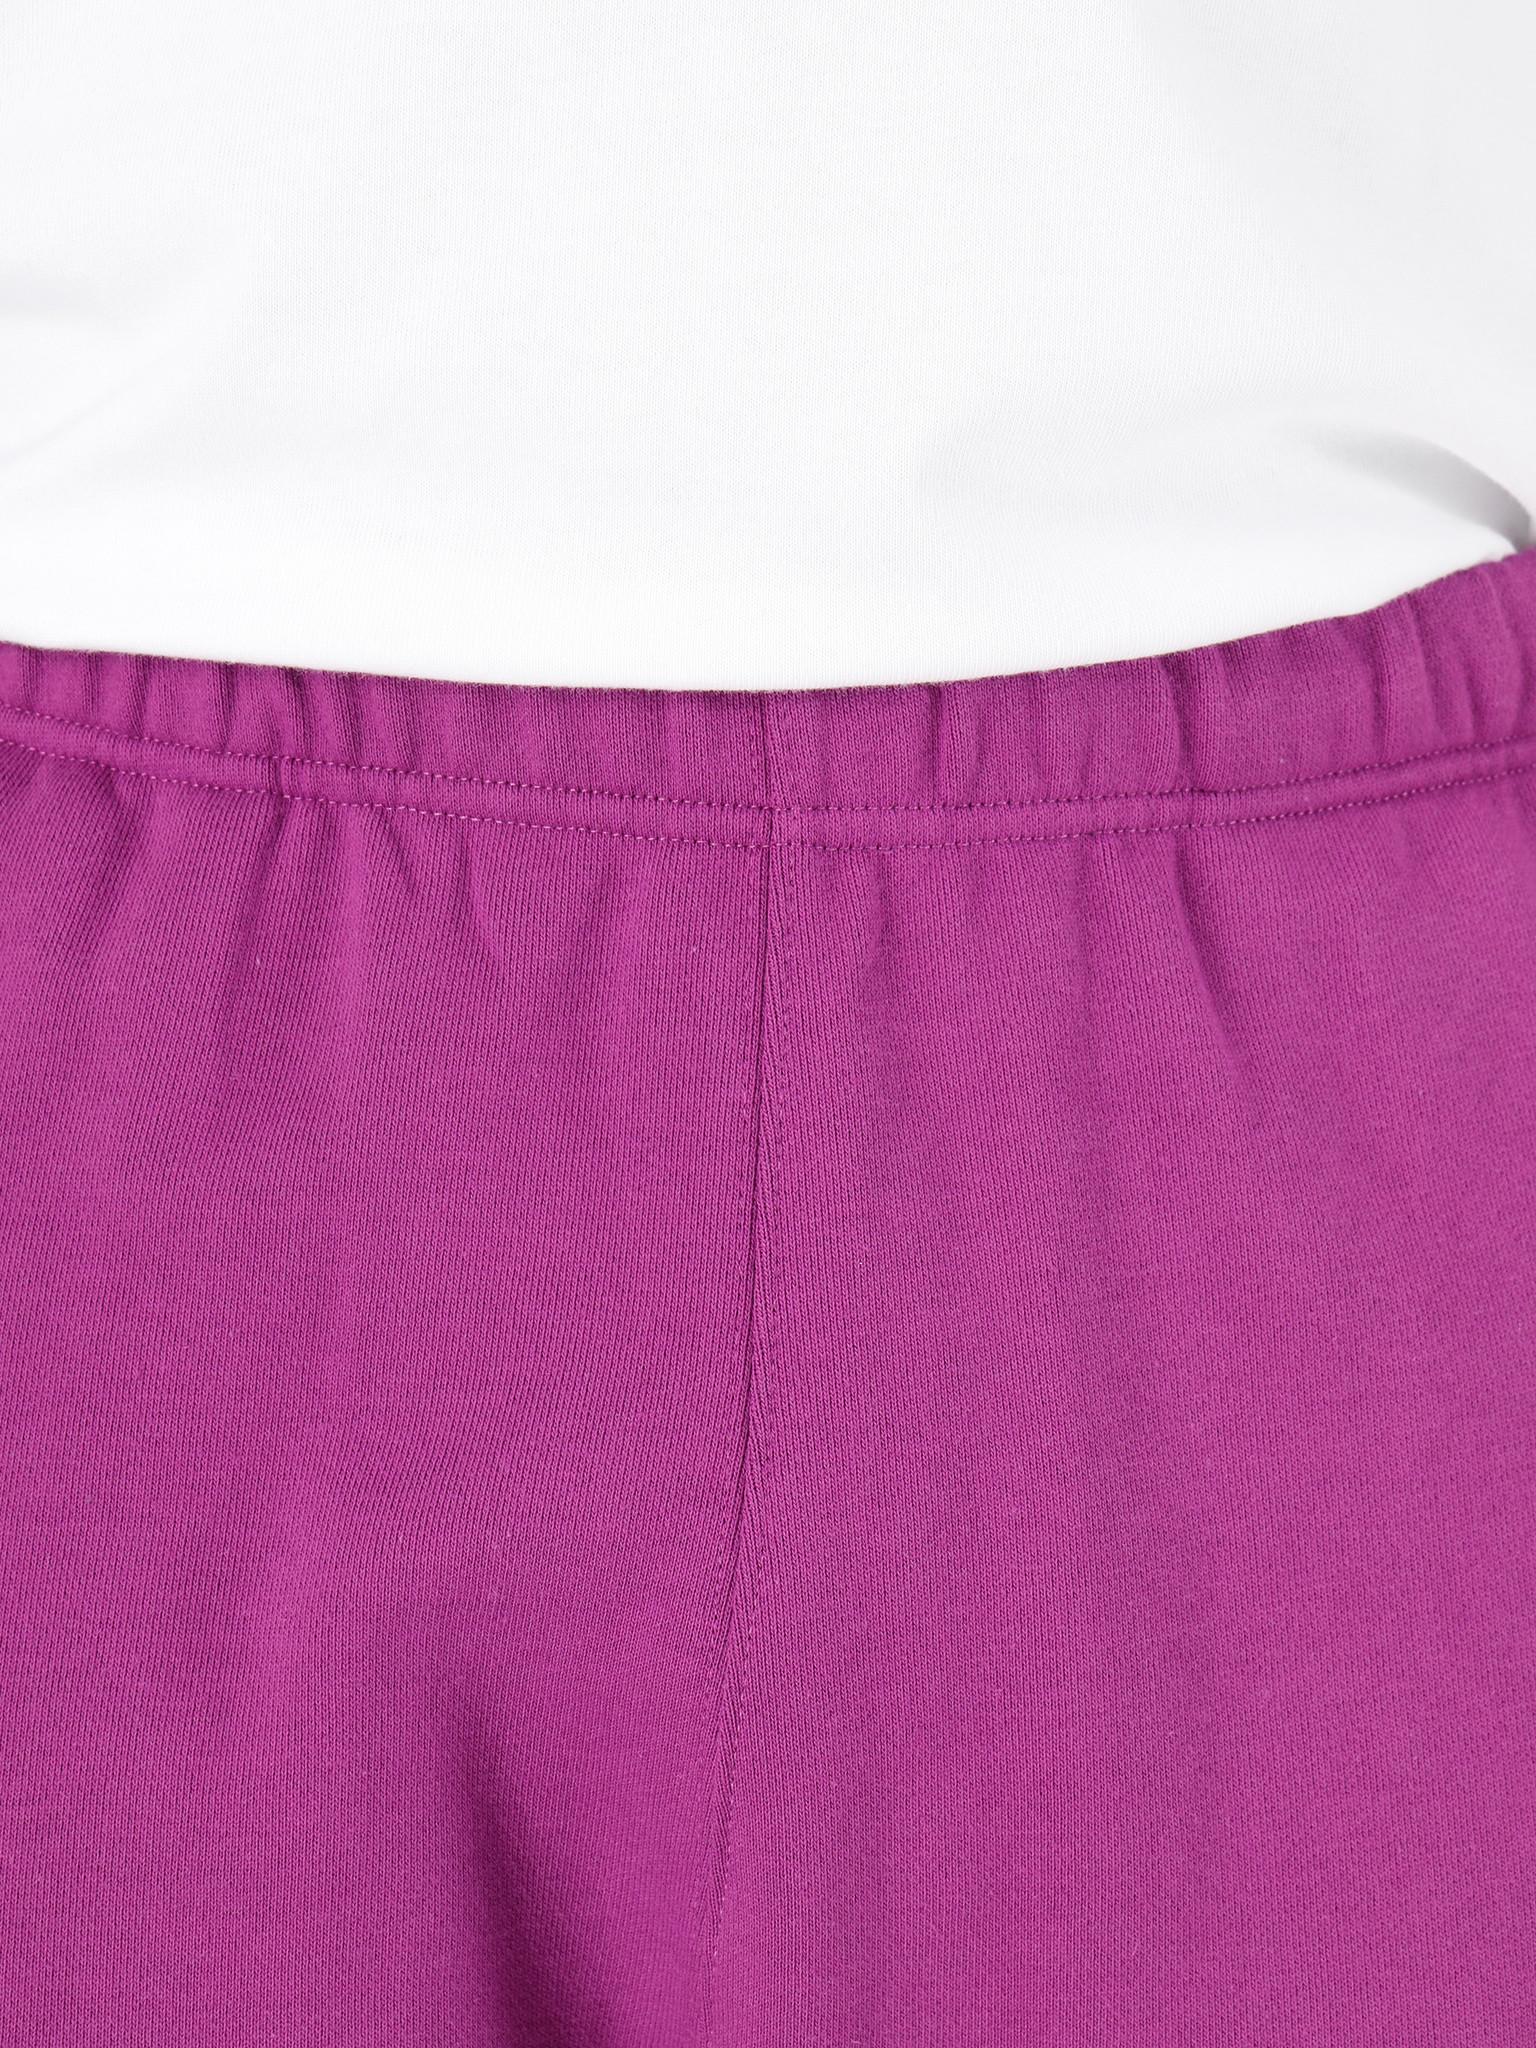 Daily Paper Daily Paper Esalias Sweatpants Magenta Purple 20E1PA02-01